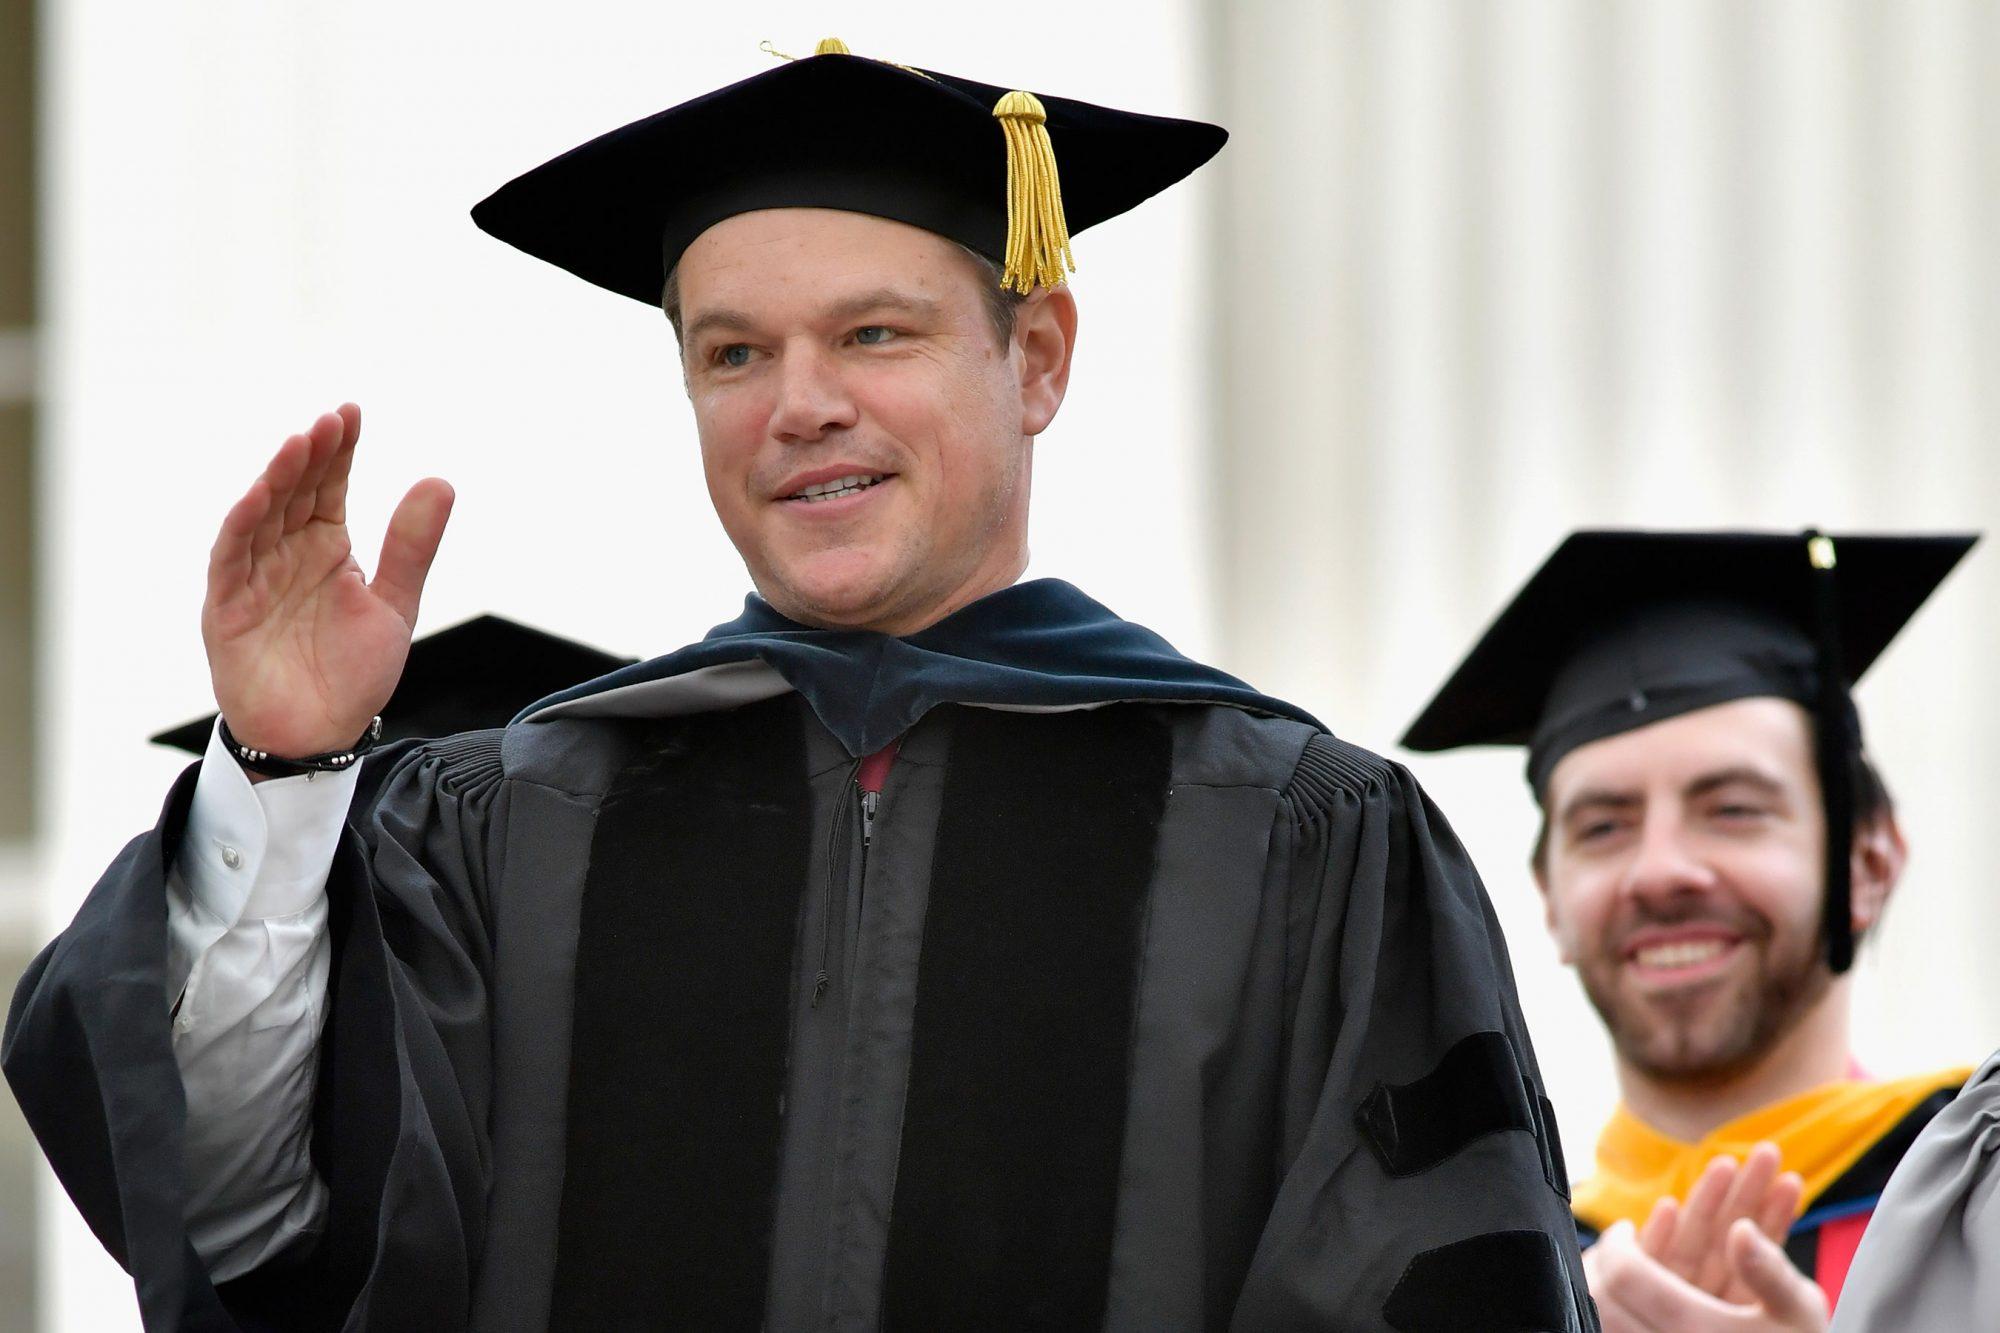 Matt Damon Speaks at MIT 2016 Commencement Day